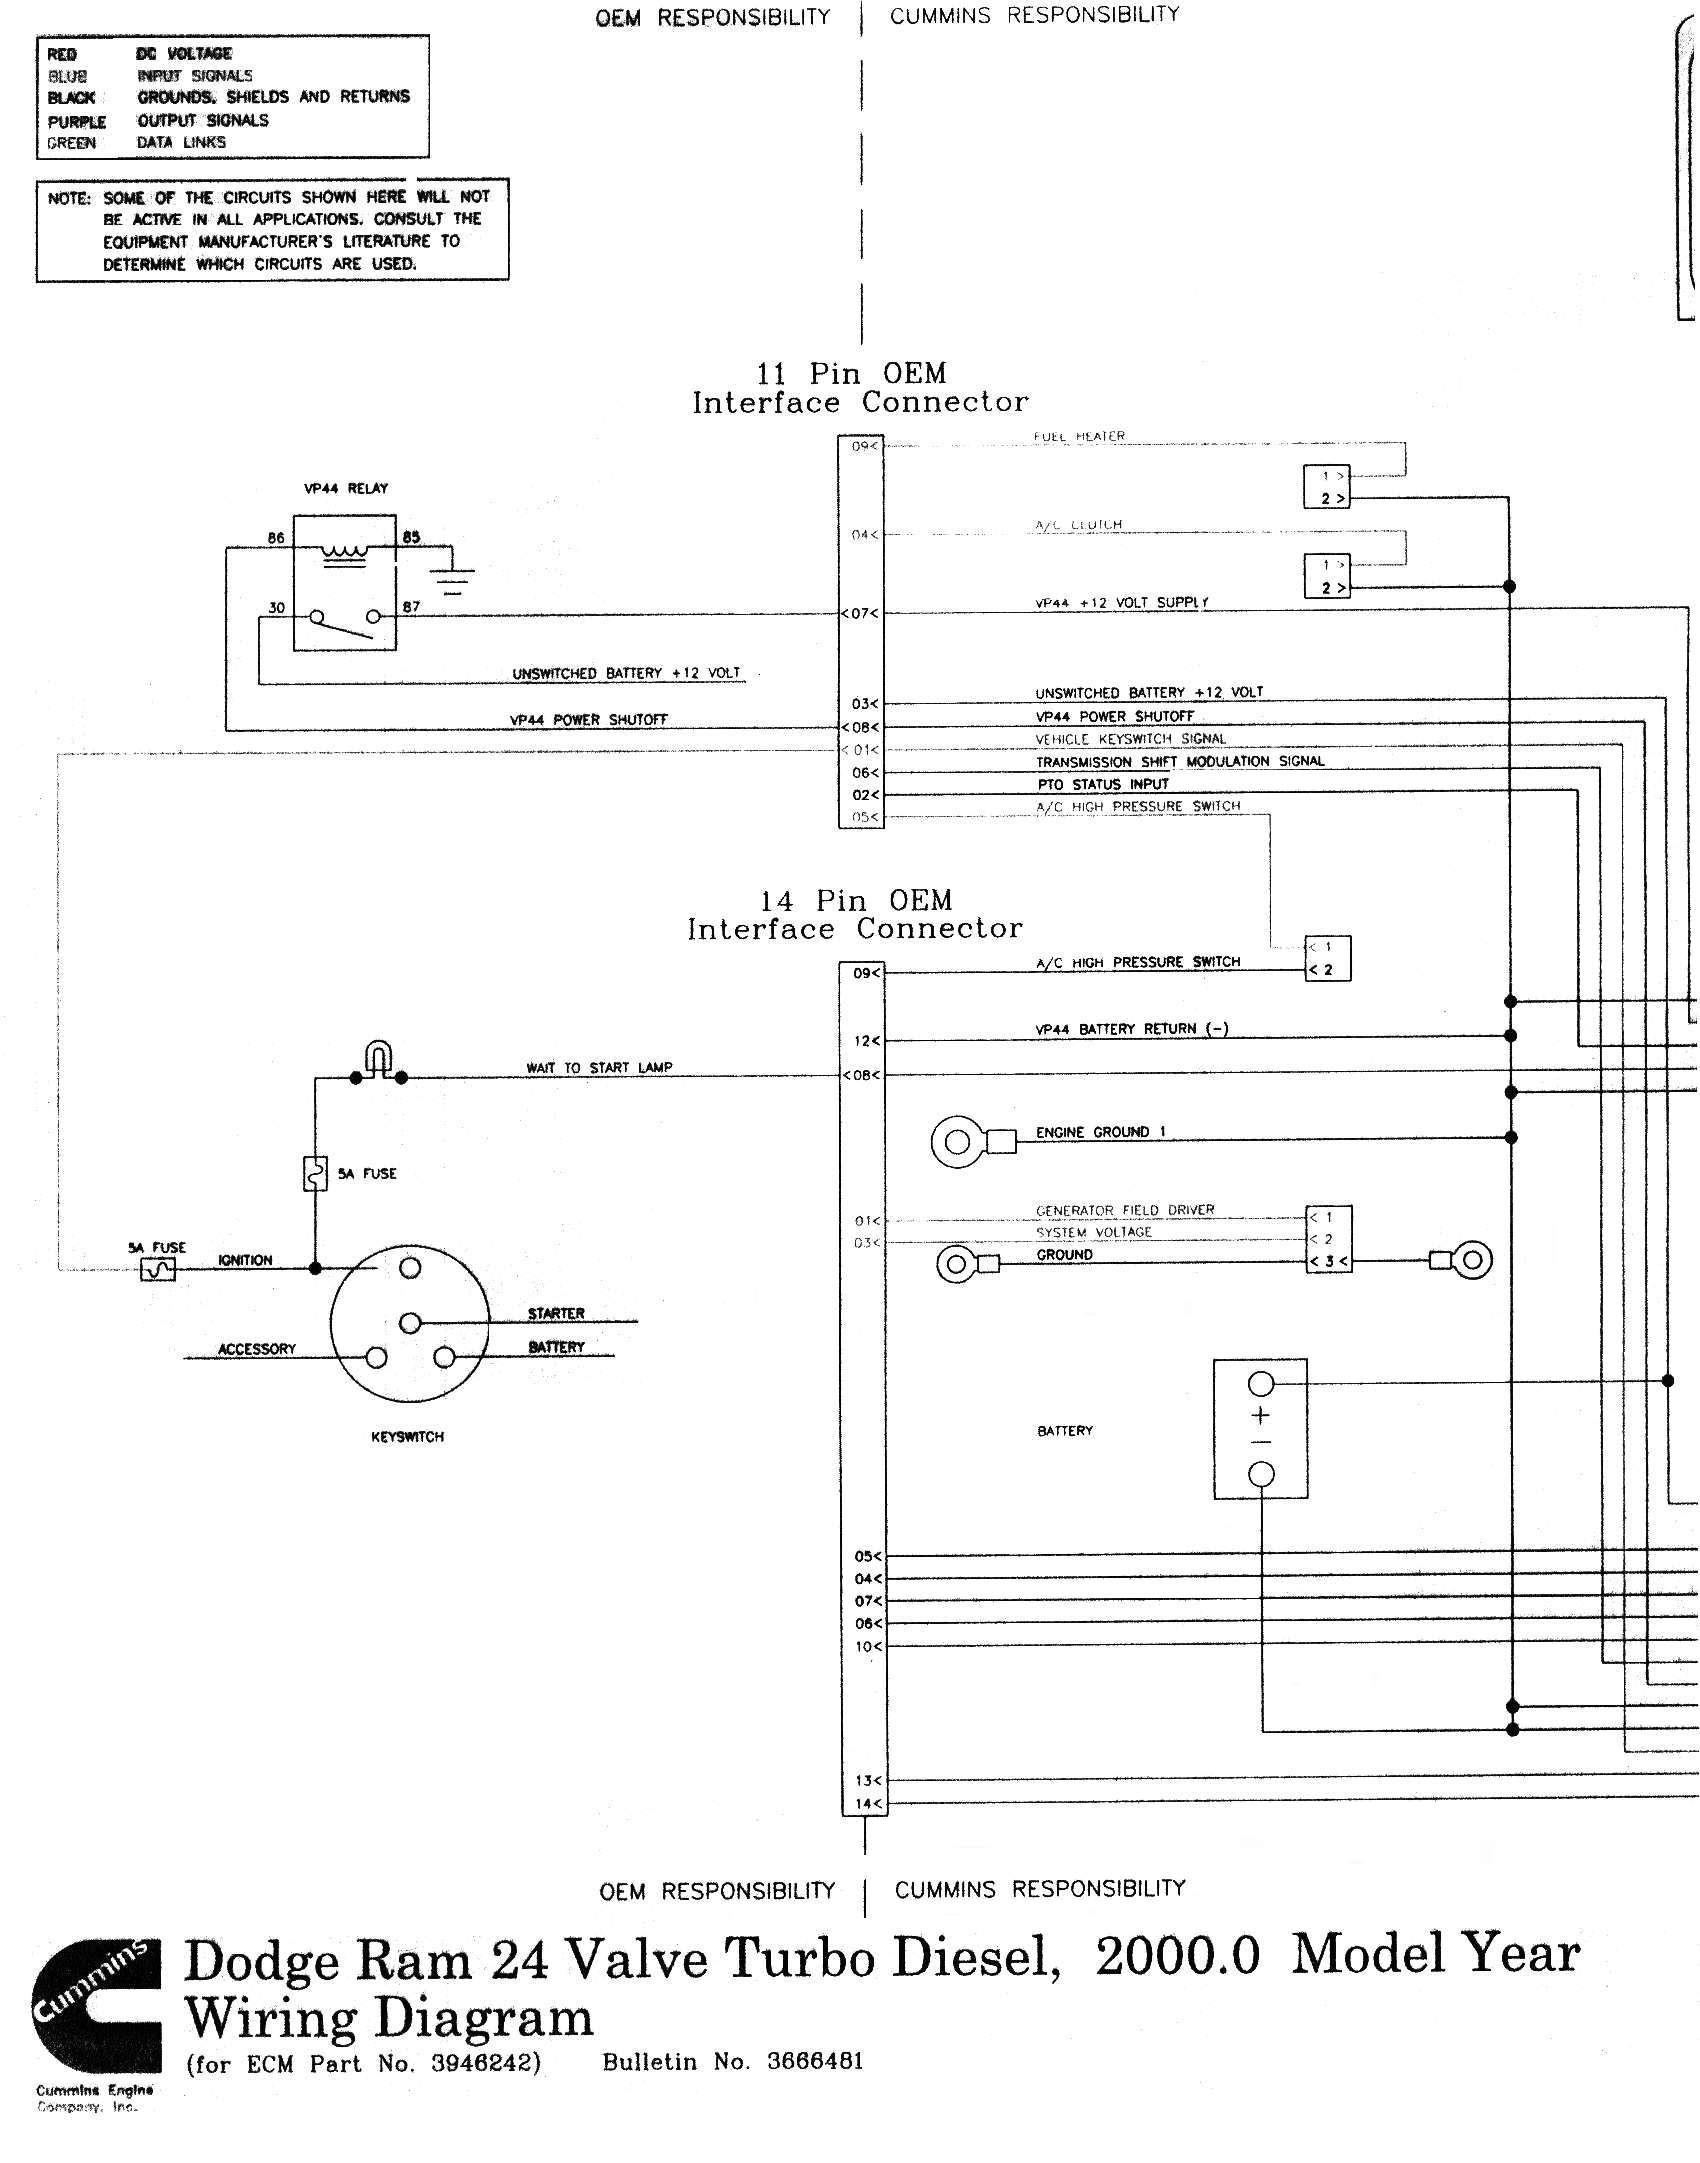 Control Module Ecms Half Switched Schematic Wiring Diagram Left